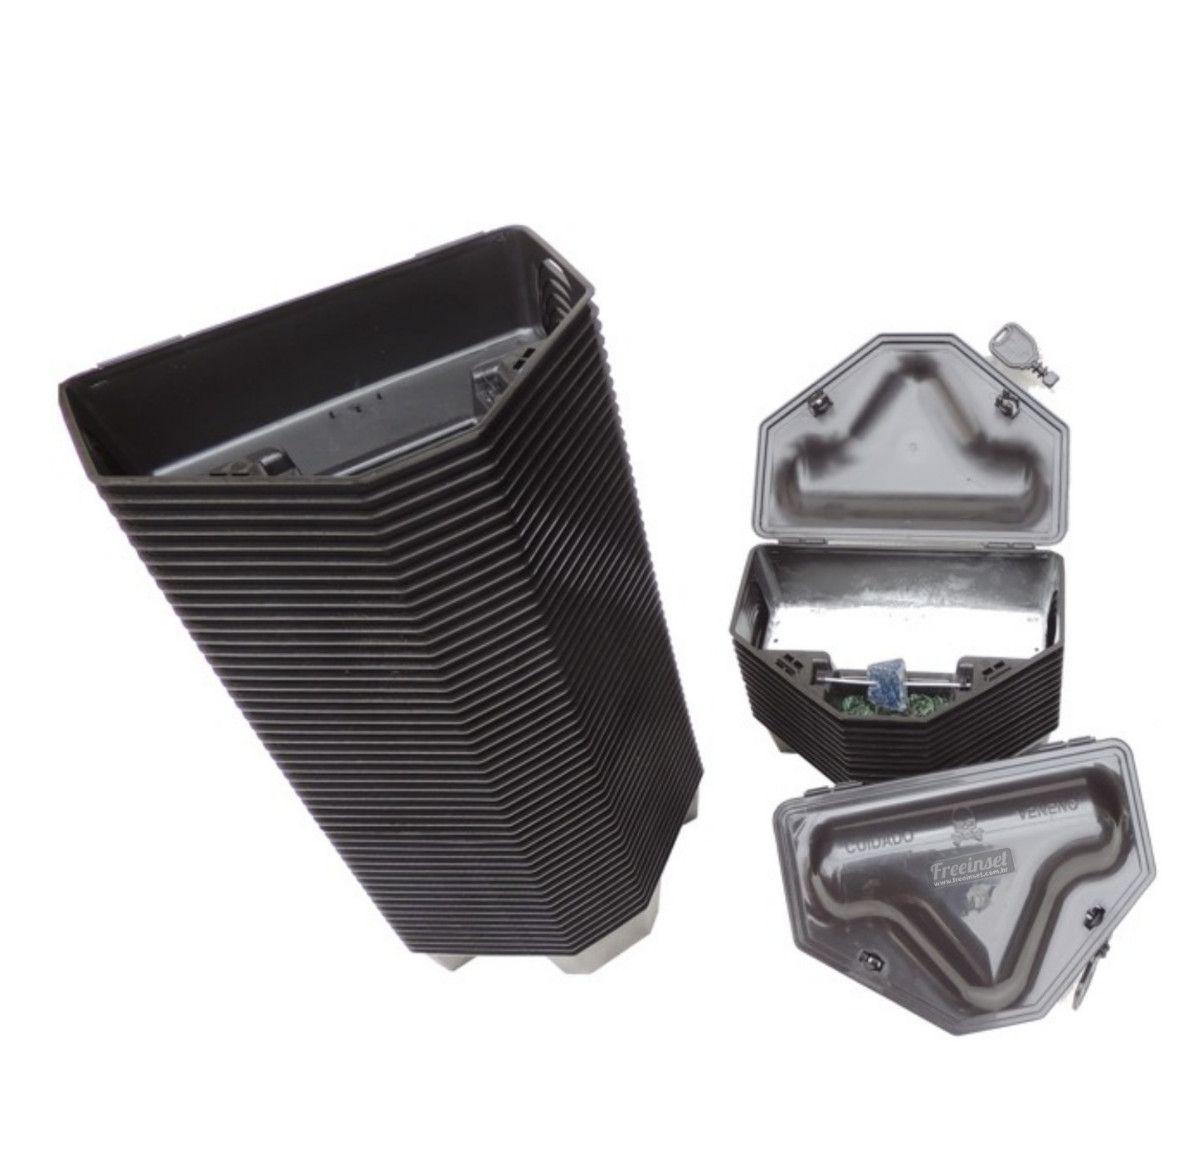 Kit 40 Porta Iscas Com Chave